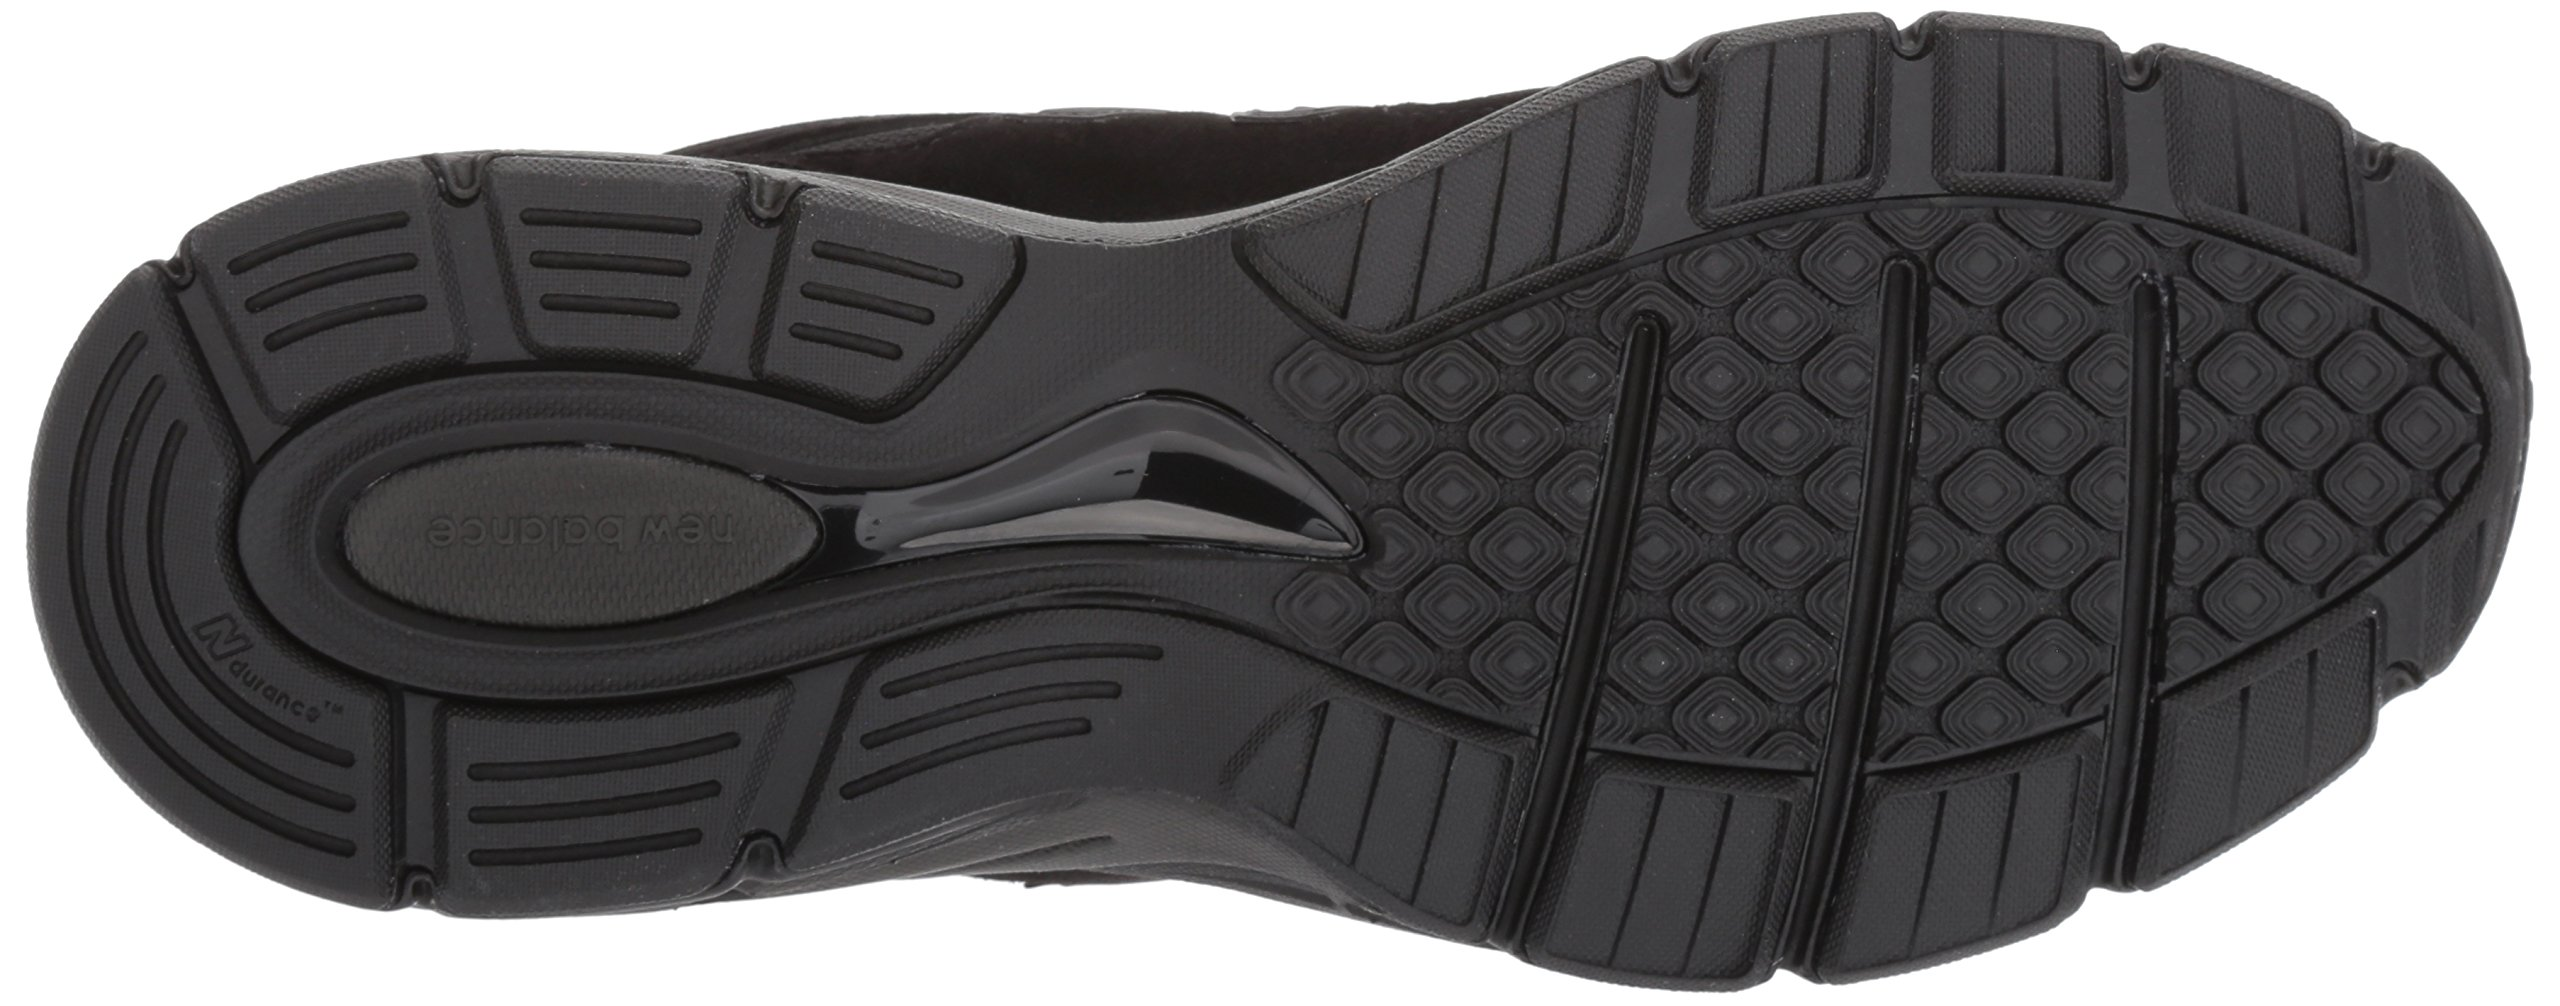 New Balance Men's 990V4 Running Shoe, Black/Black, 11 2E US by New Balance (Image #3)